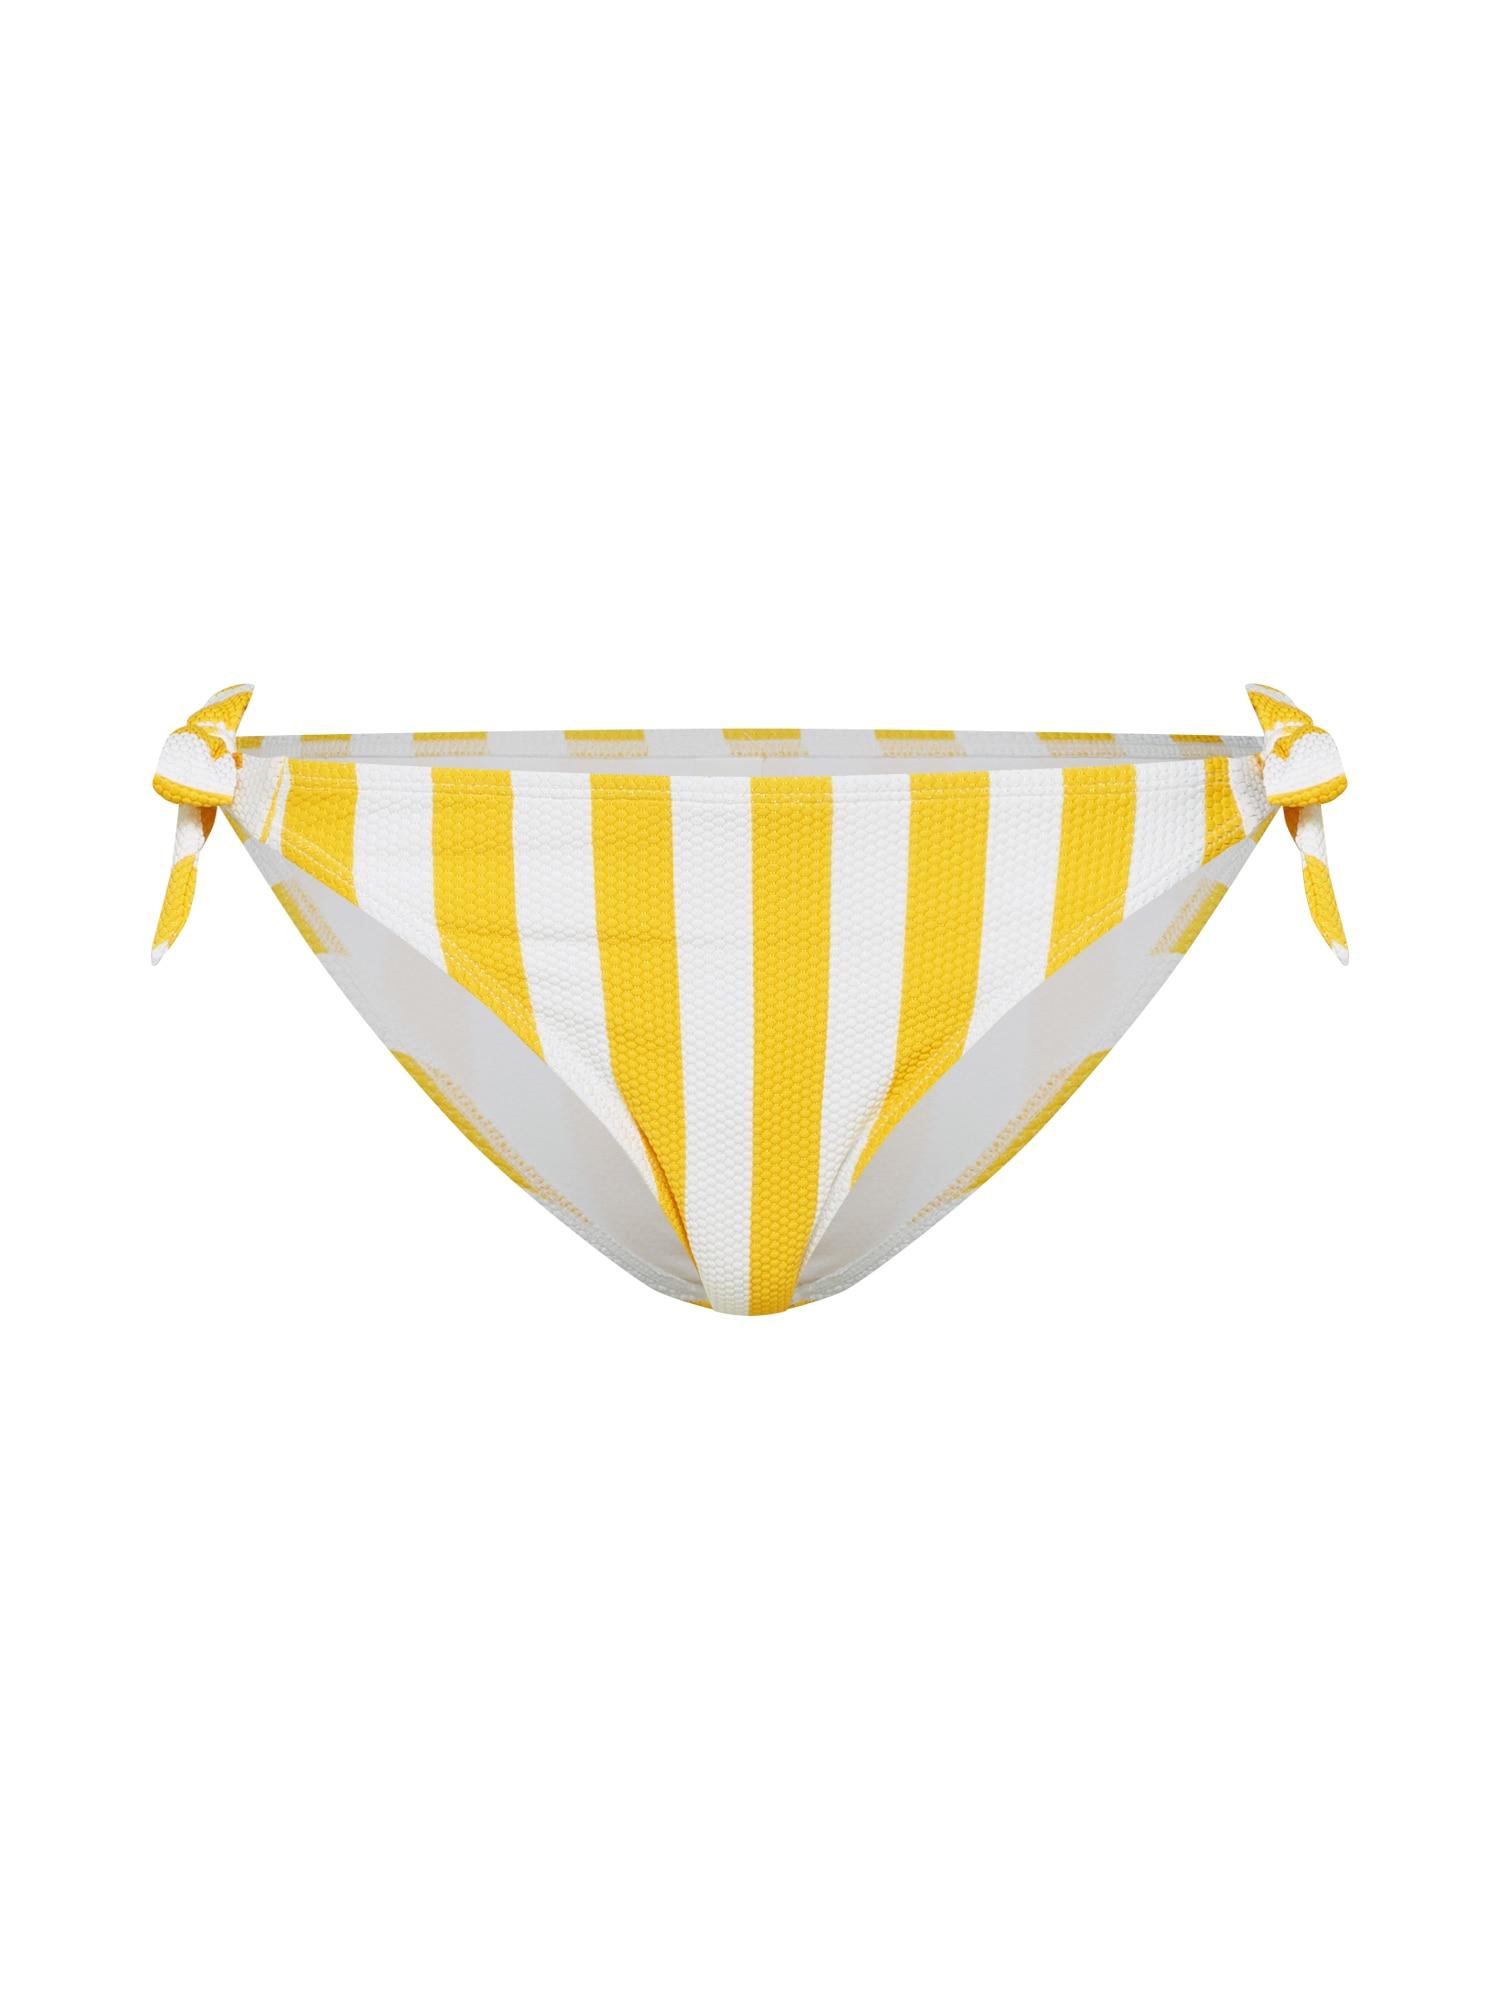 Spodní díl plavek Giorgio žlutá bílá Hunkemöller